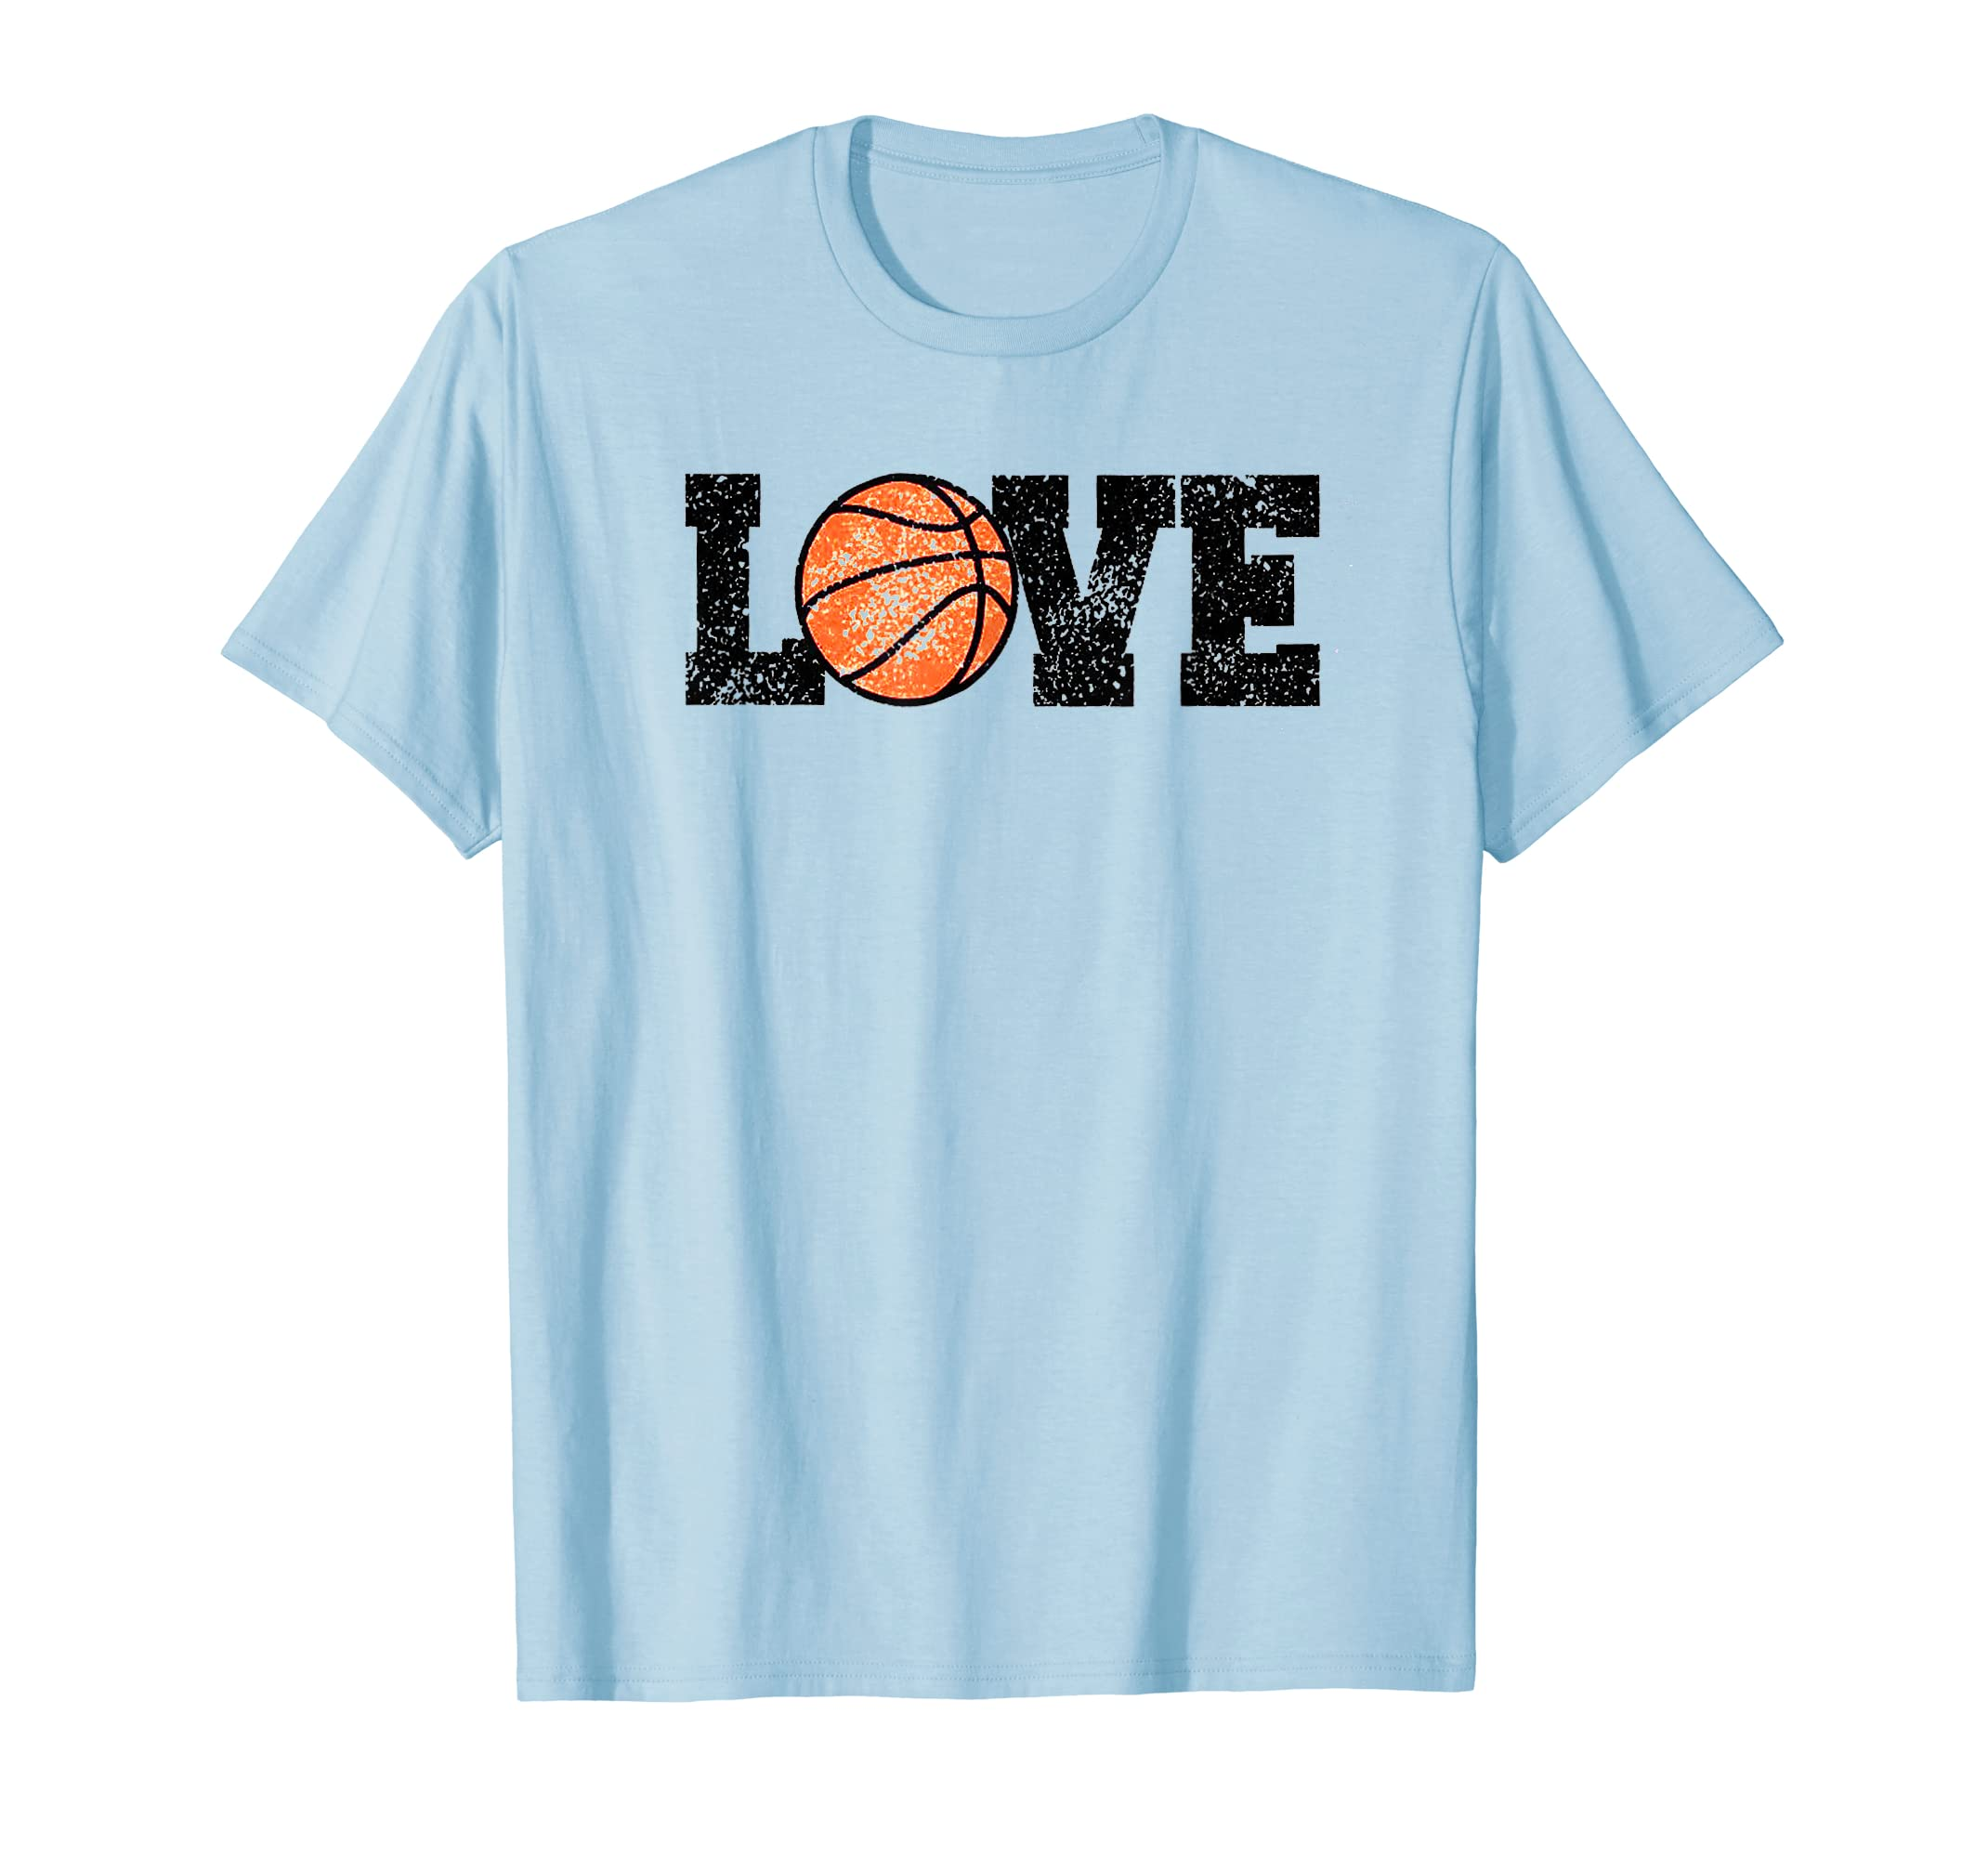 1befaaa753b74 Amazon.com: I Love Basketball T-Shirt Basketball Lover Gift Tees ...